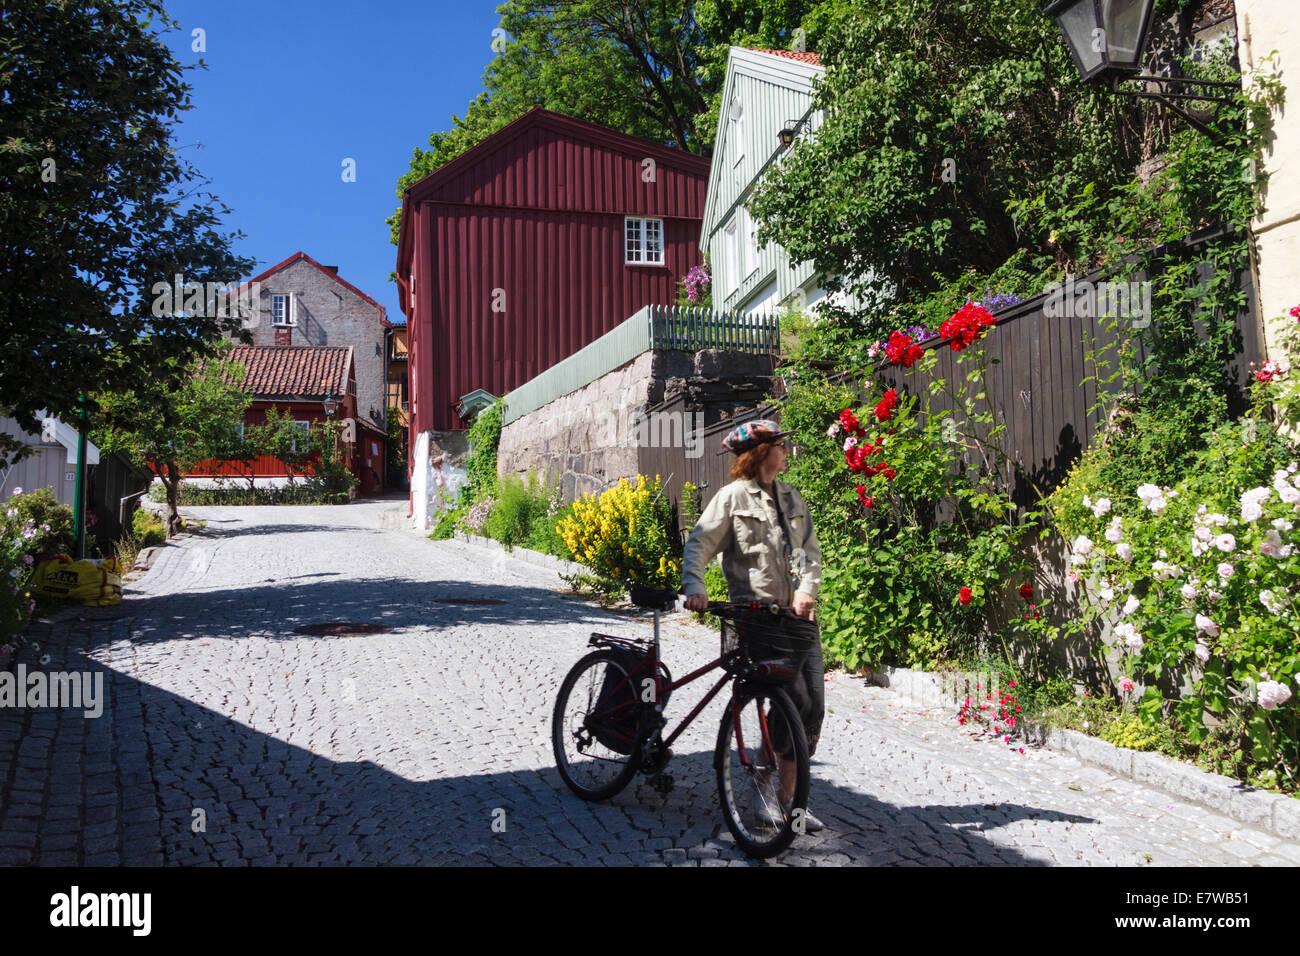 Damstredet street, Oslo, Norway - Stock Image